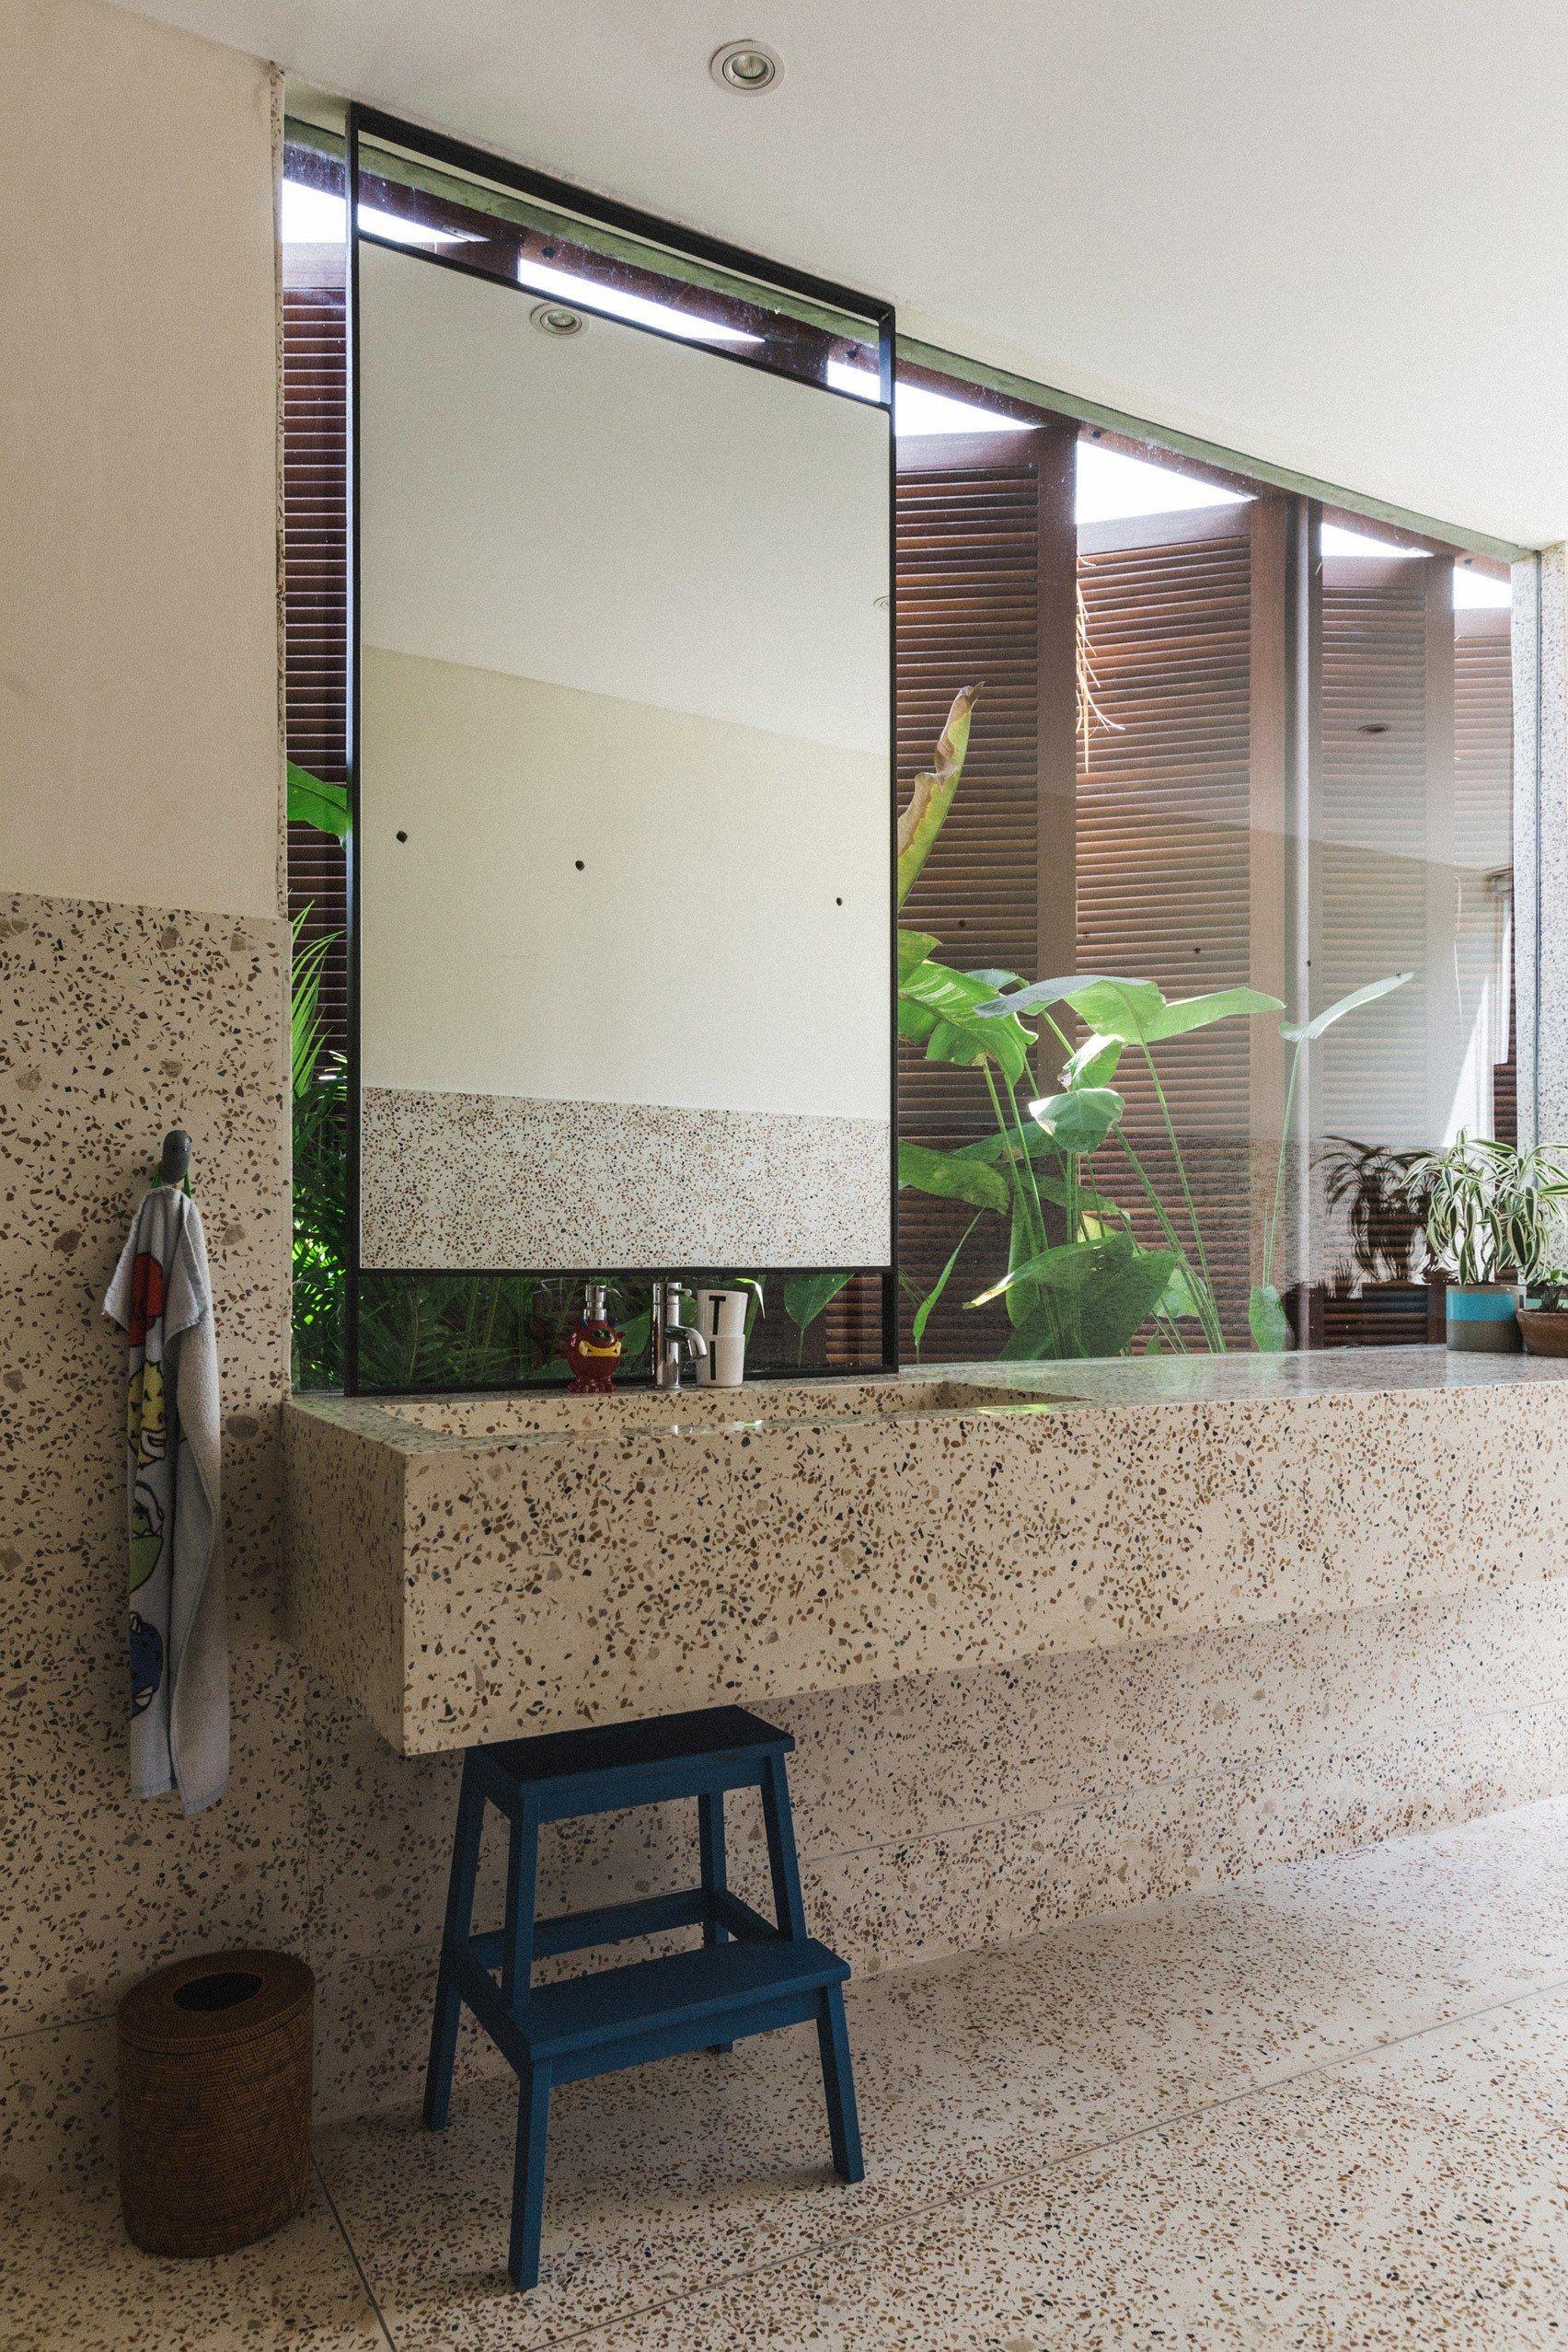 A Brutalist Home Set Amongst The Tropical Landscape Of Bali